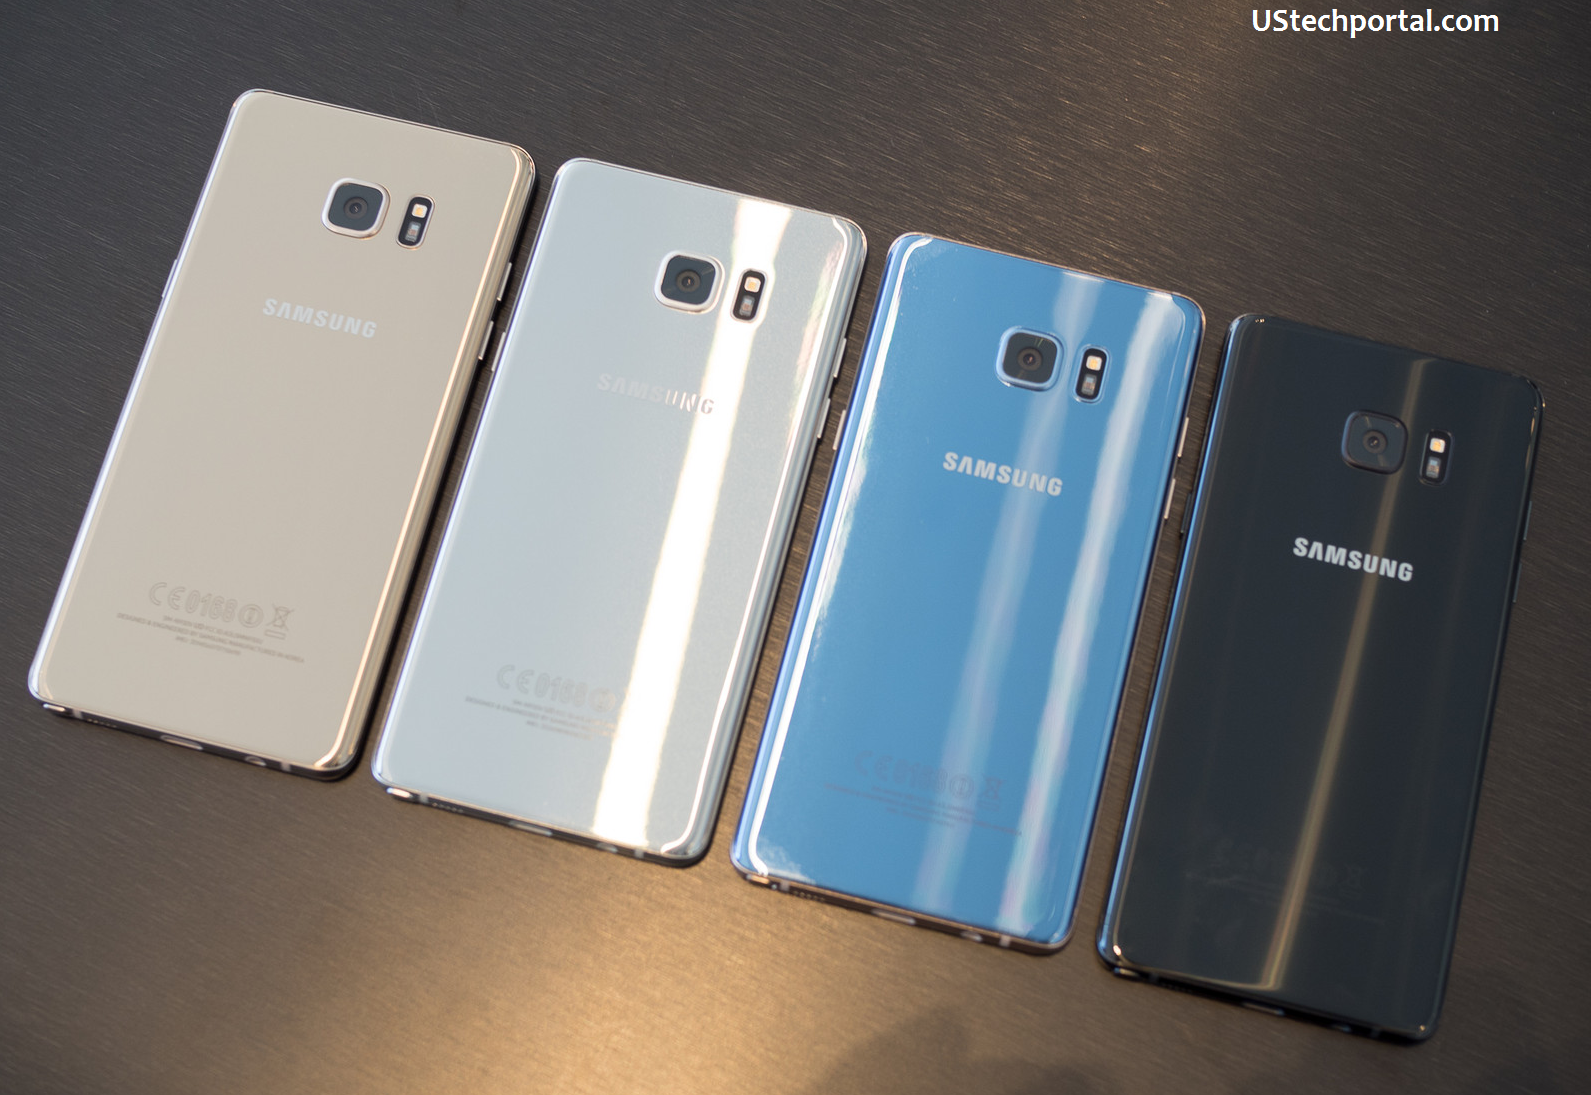 Samsung Galaxy S8 Review Advantages Disadvantages Release